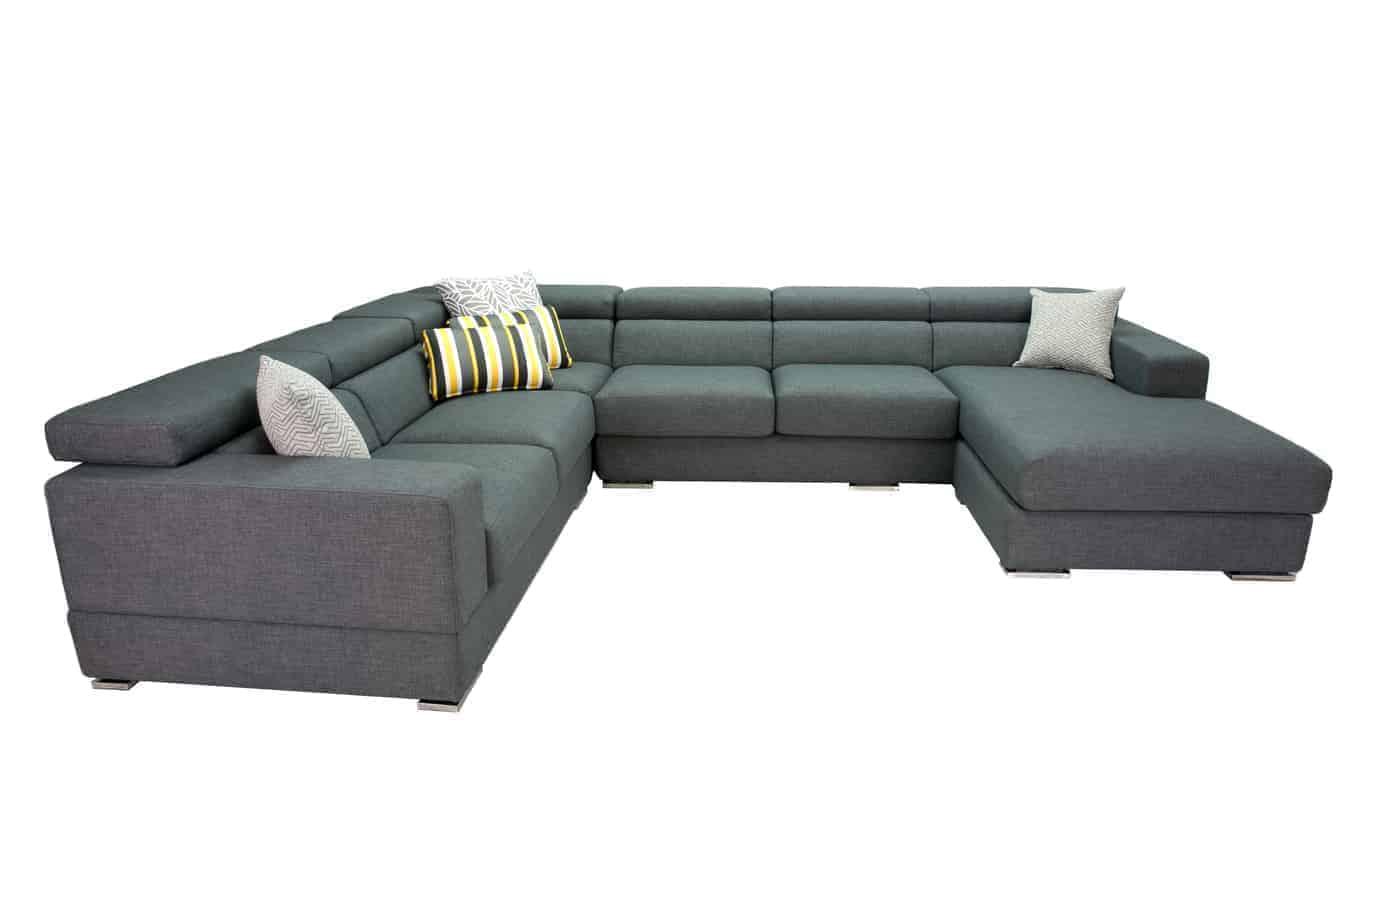 Tennyson Chaise Corner Modular Lounge 1